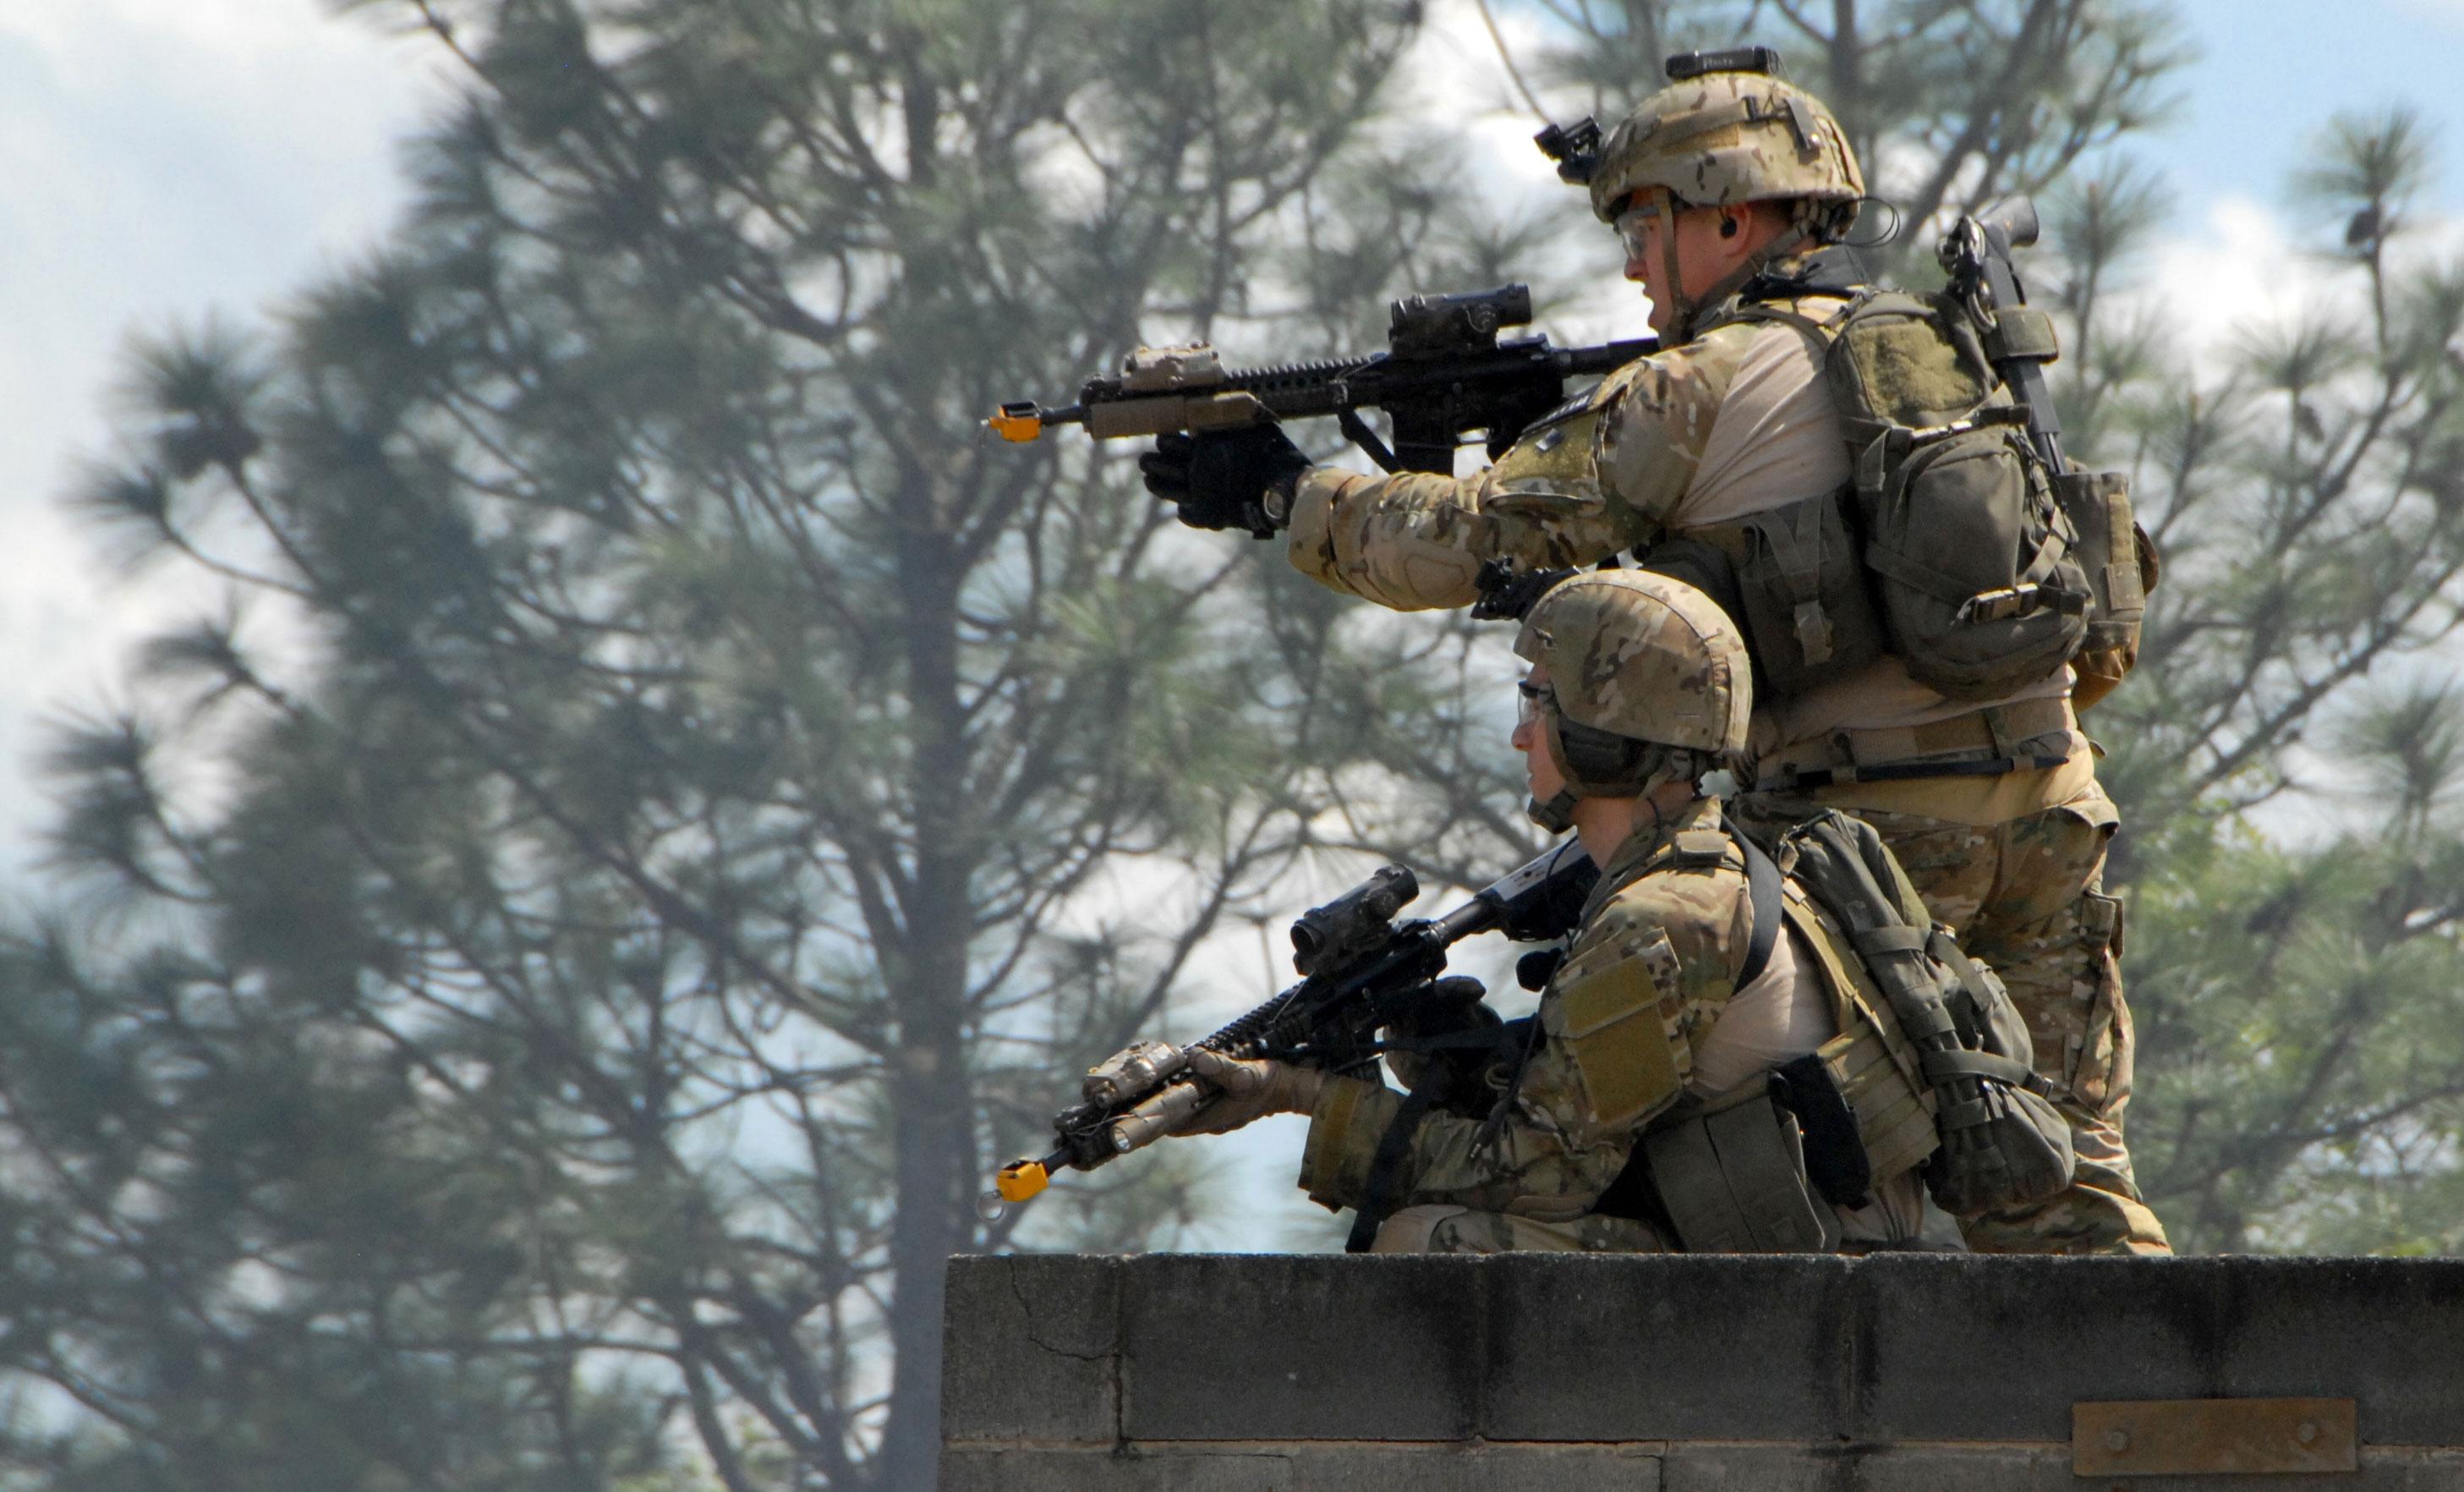 httpwwwamericanspecialopscomphotosrangersrangers armyphp 2914x1764